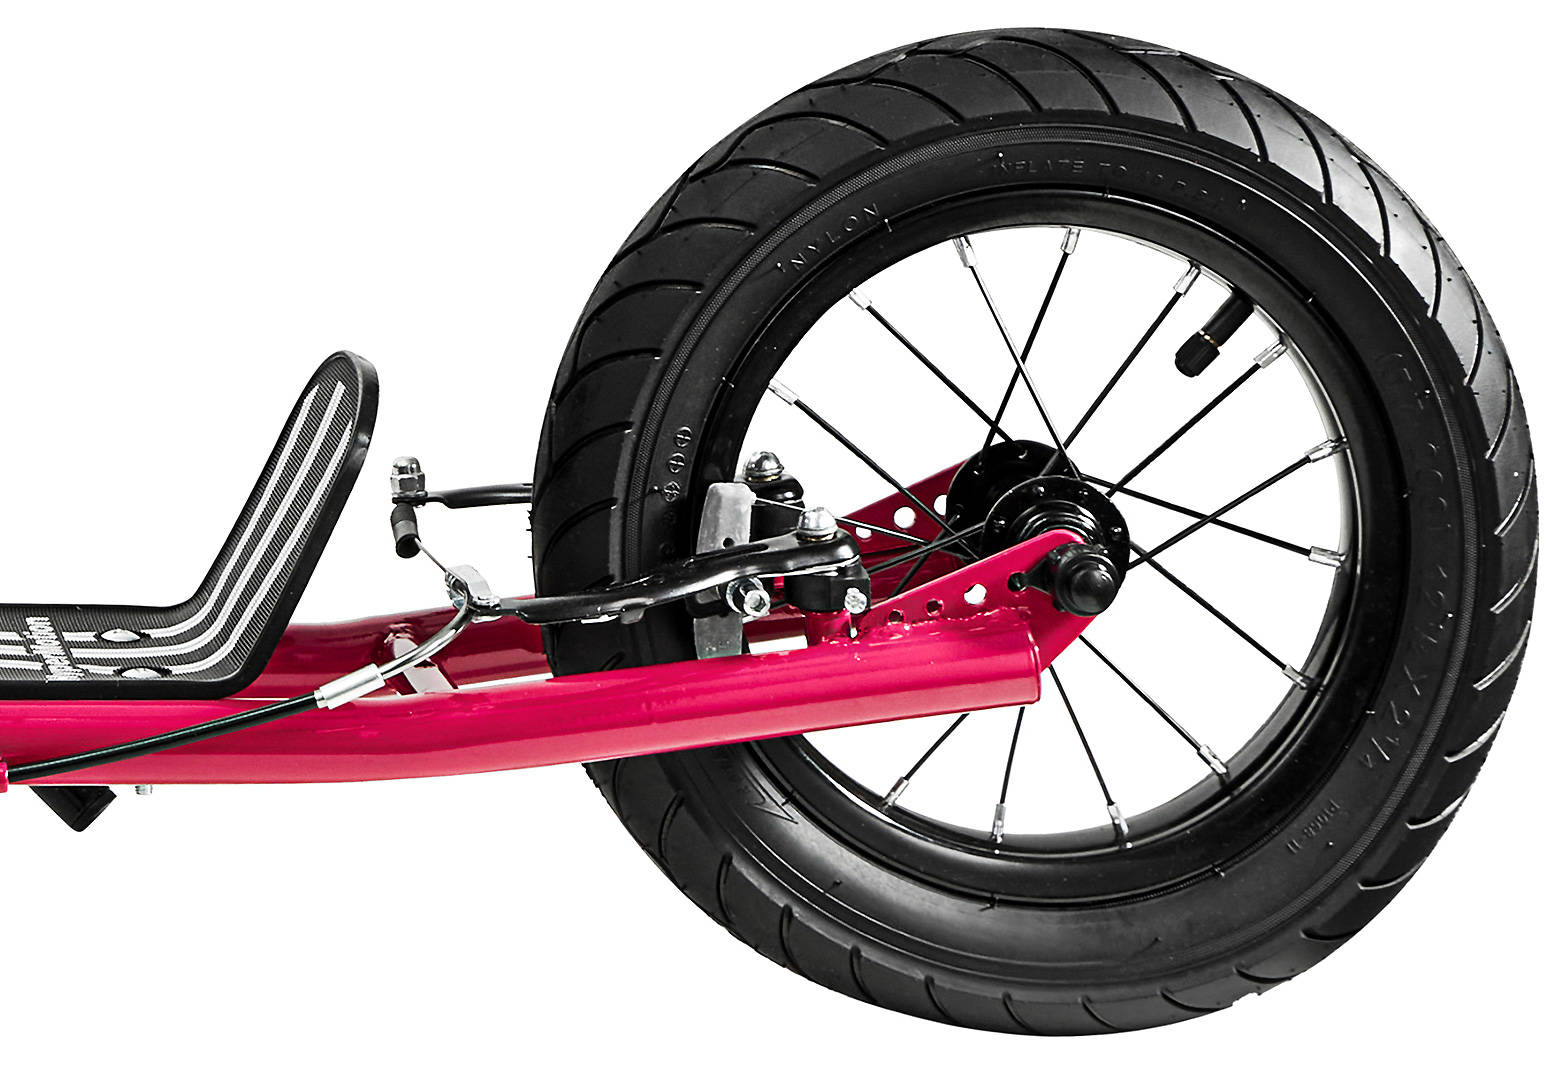 Hulajnoga HyperMotion RUBY 12 (pompowane koła 30 cm) - fuksja/magenta